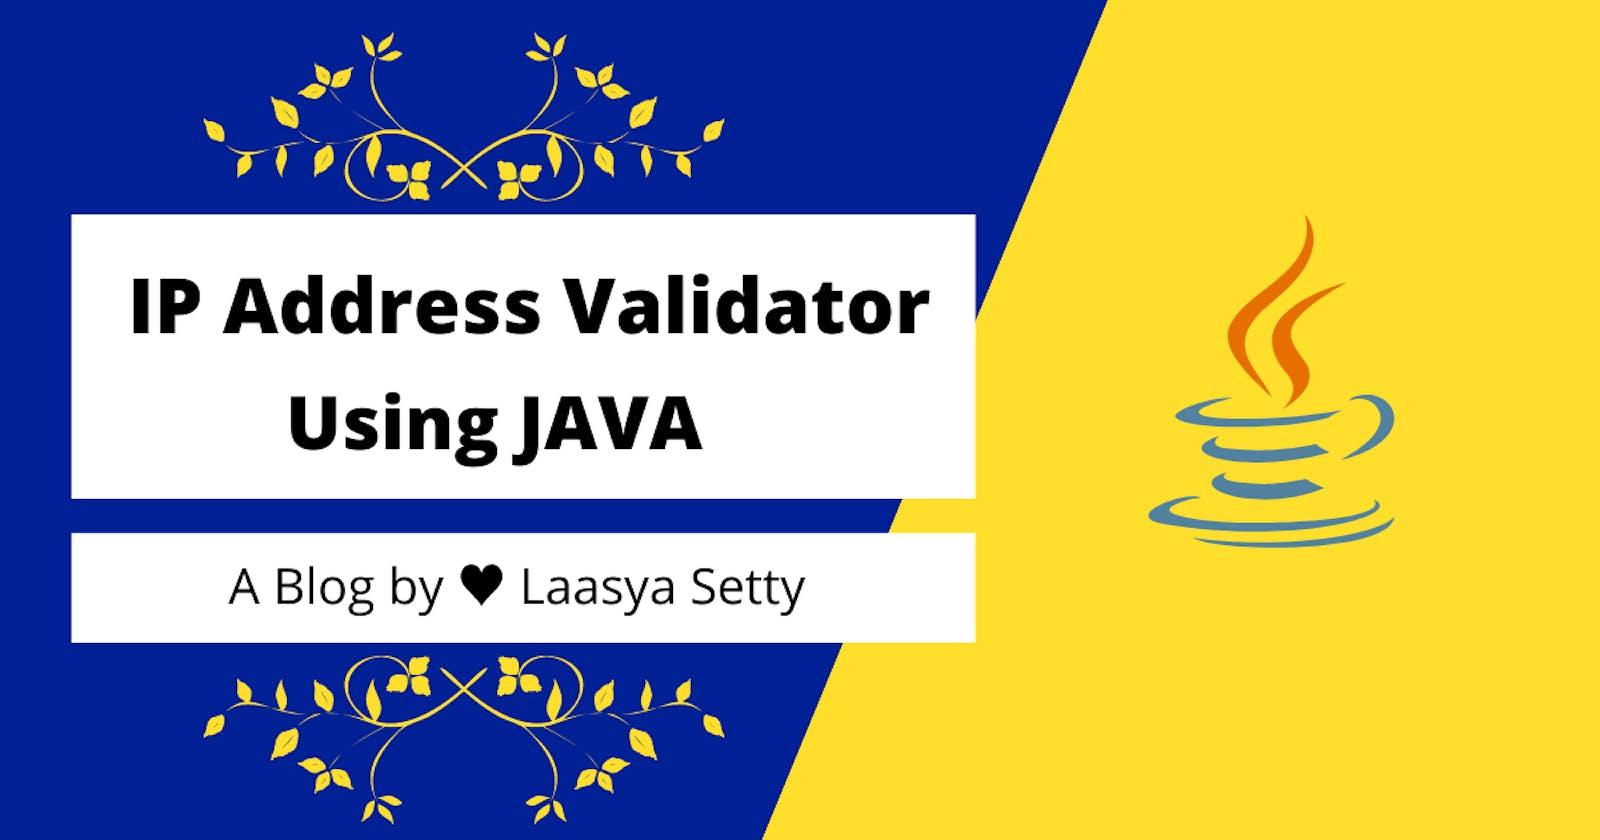 IP Address Validator using JAVA.